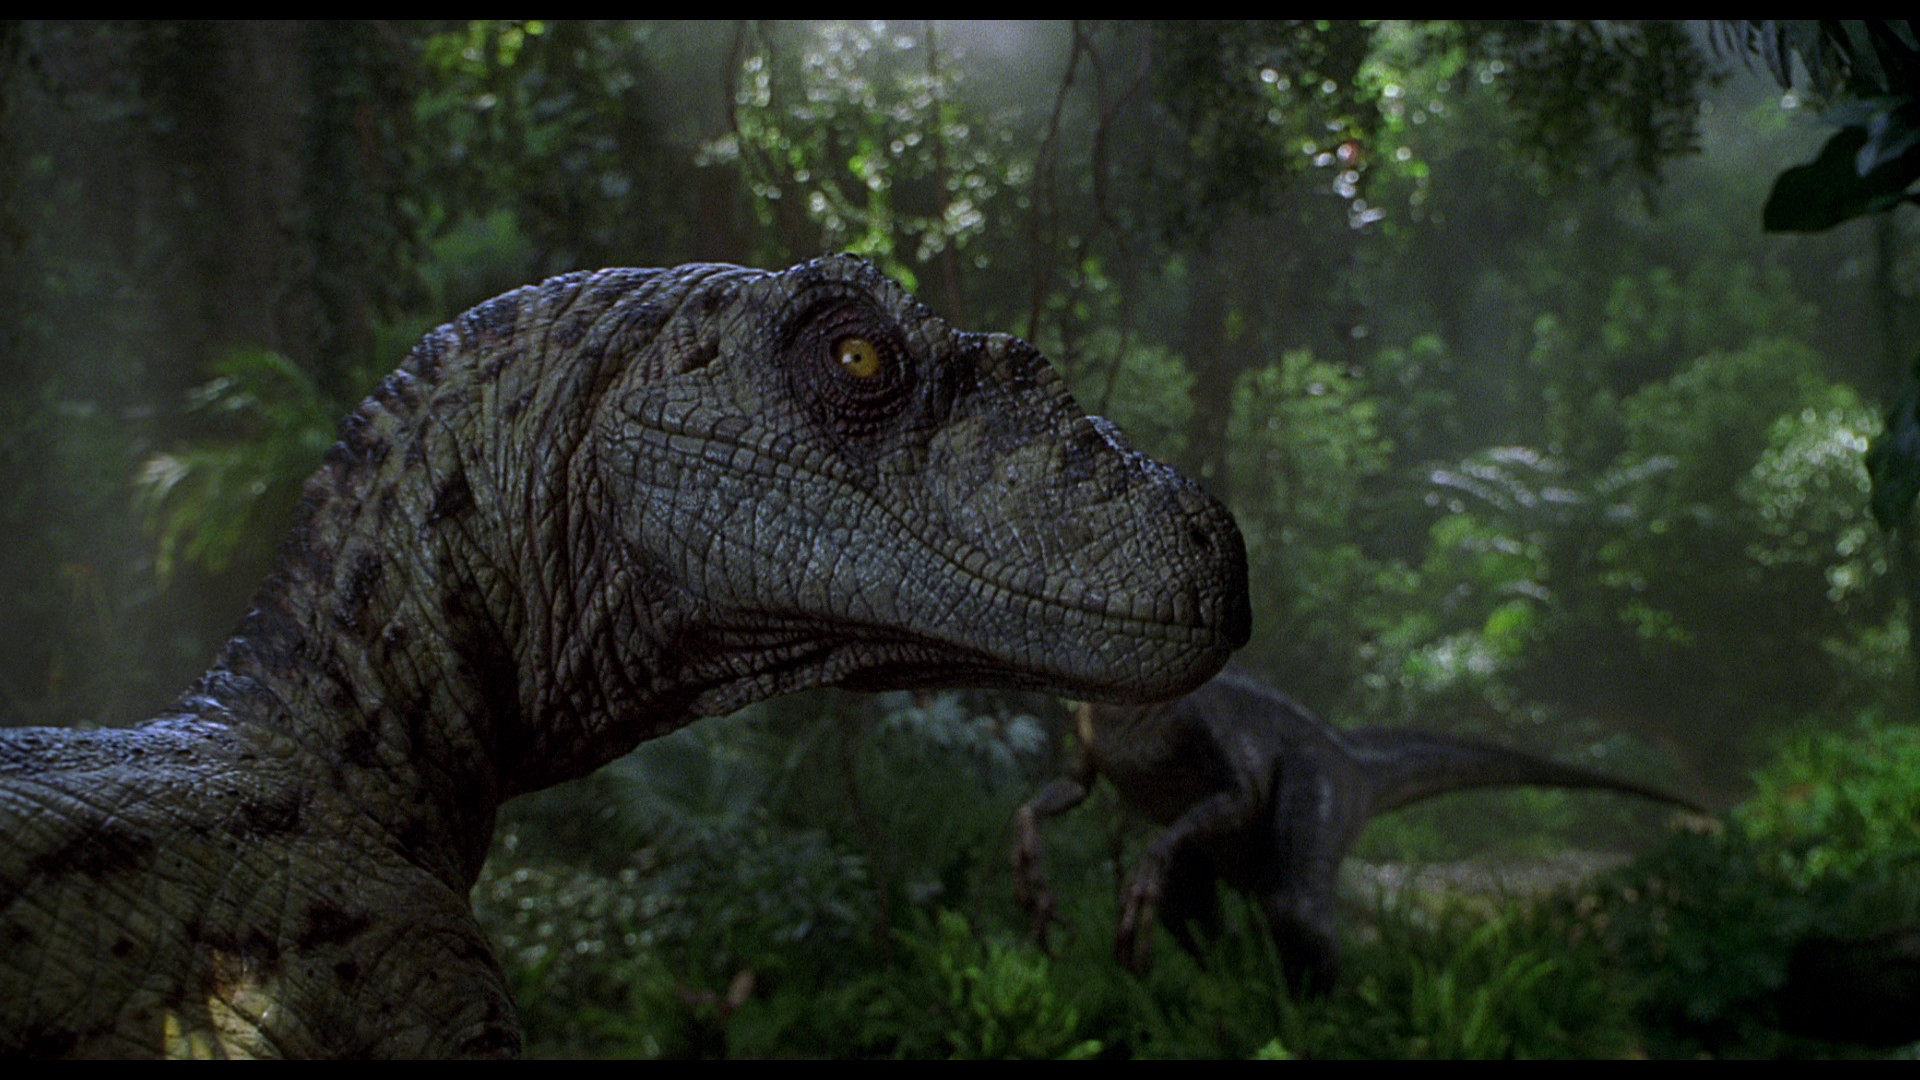 Jurassic park background wallpapertag - Jurassic park phone wallpaper ...